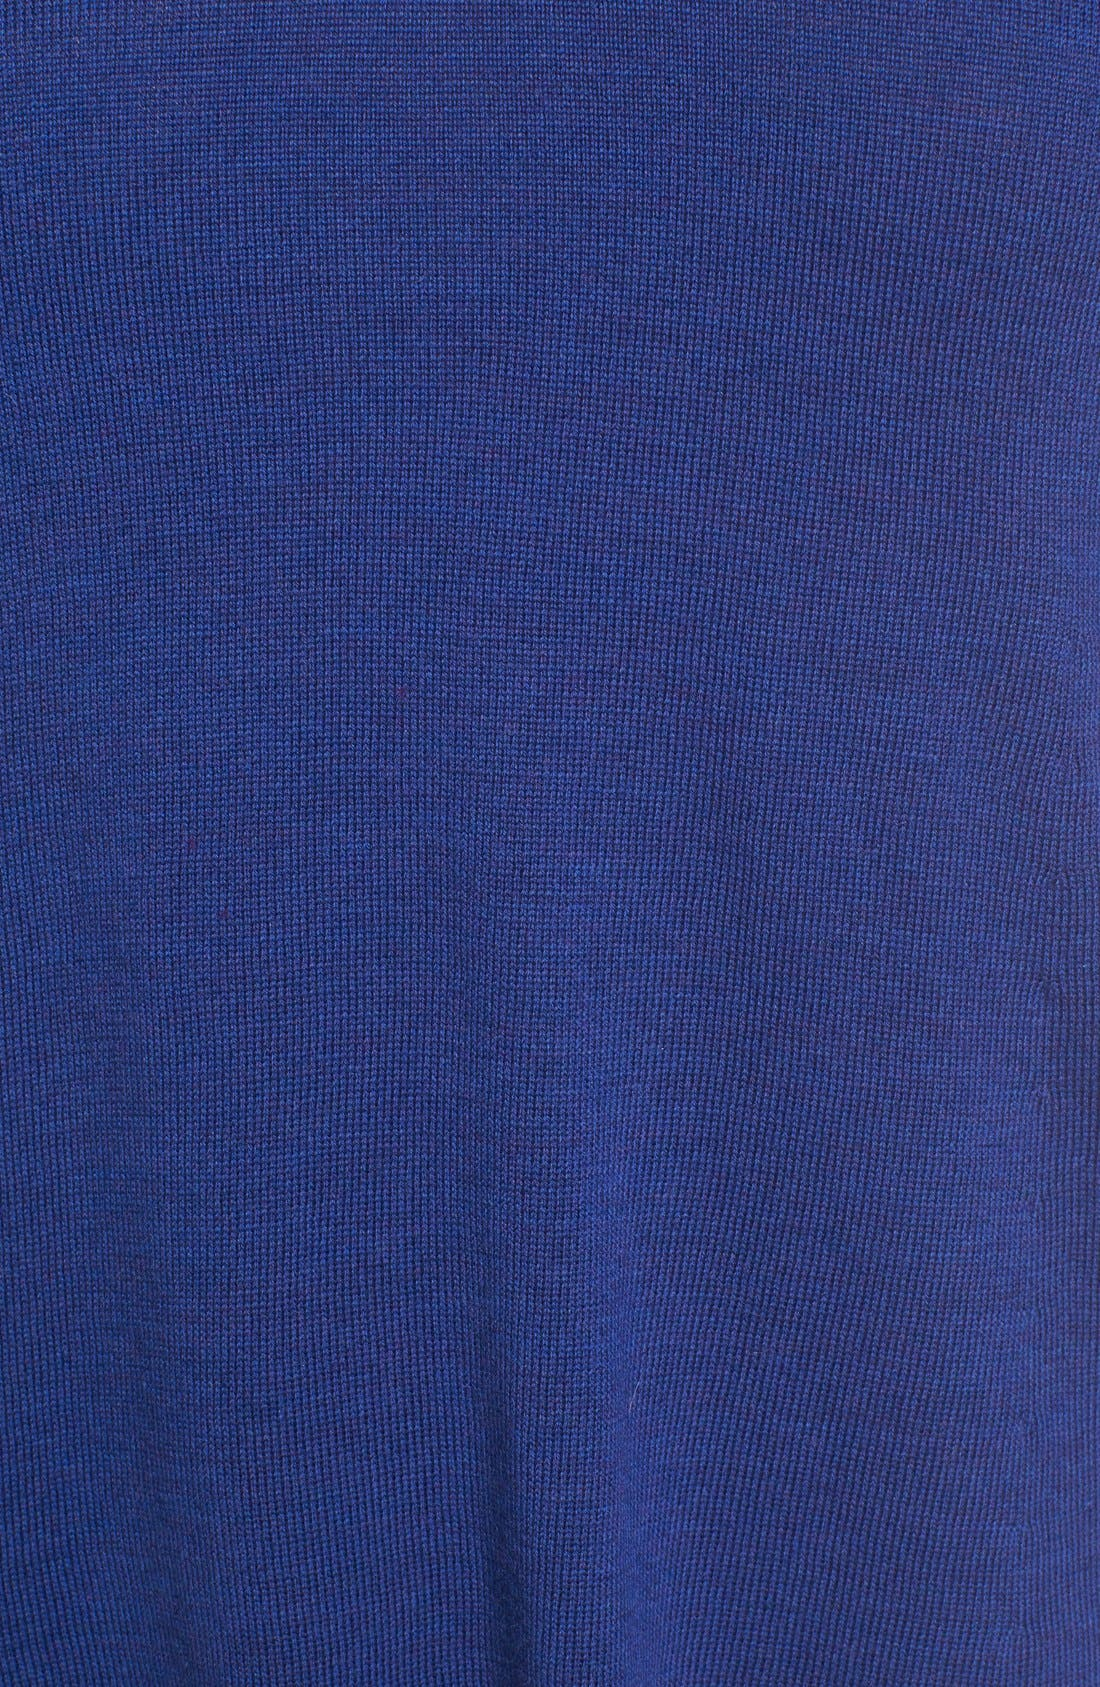 Lightweight Merino Jersey V-Neck Tunic,                             Alternate thumbnail 64, color,